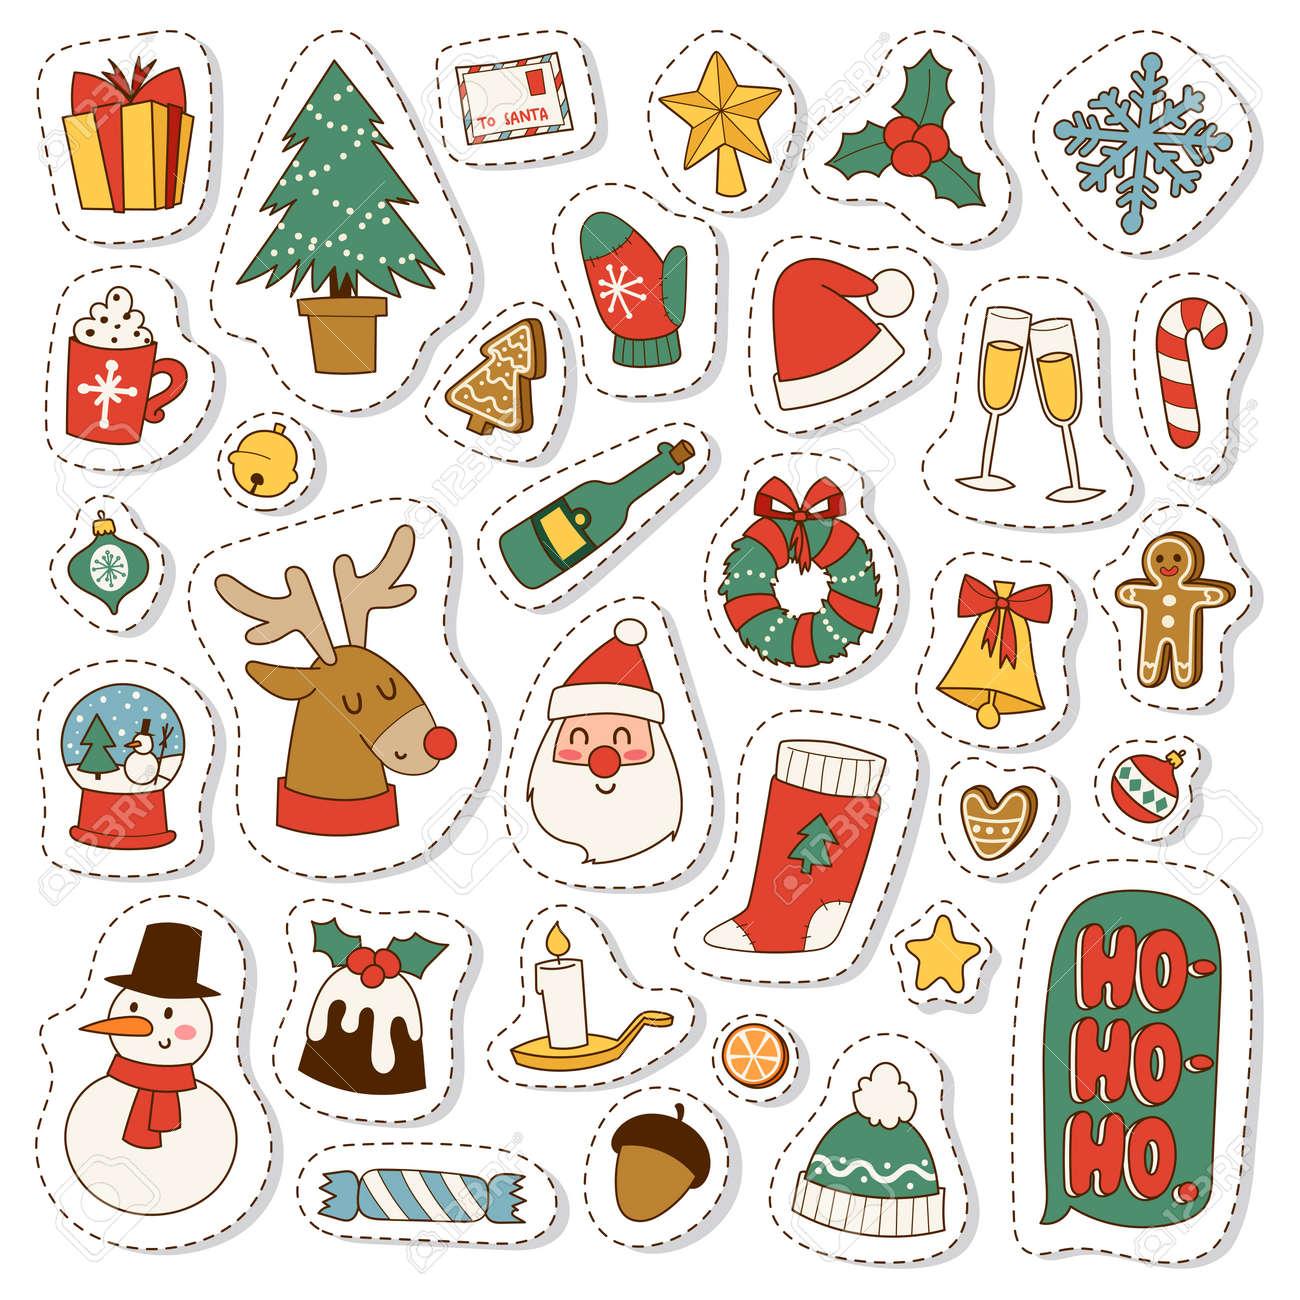 Christmas greeting card symbols vector winter celebration design christmas greeting card symbols vector winter celebration design merry christmas symbols holidays winter decoration ornament biocorpaavc